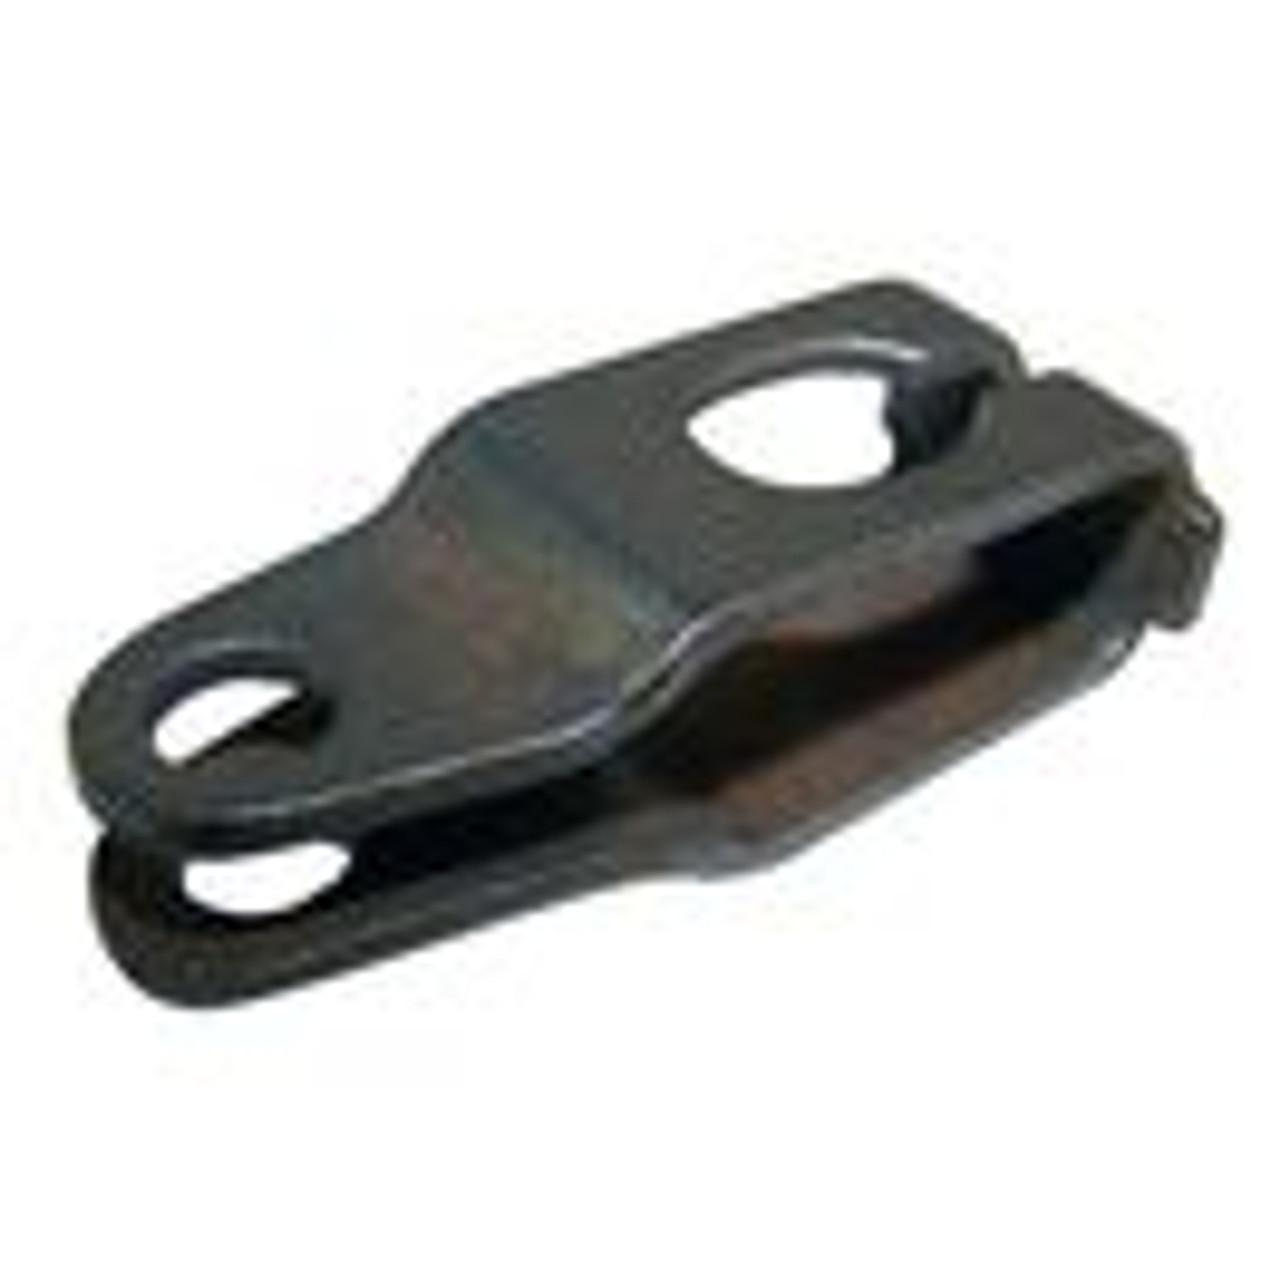 Clutch pedal cable clevis